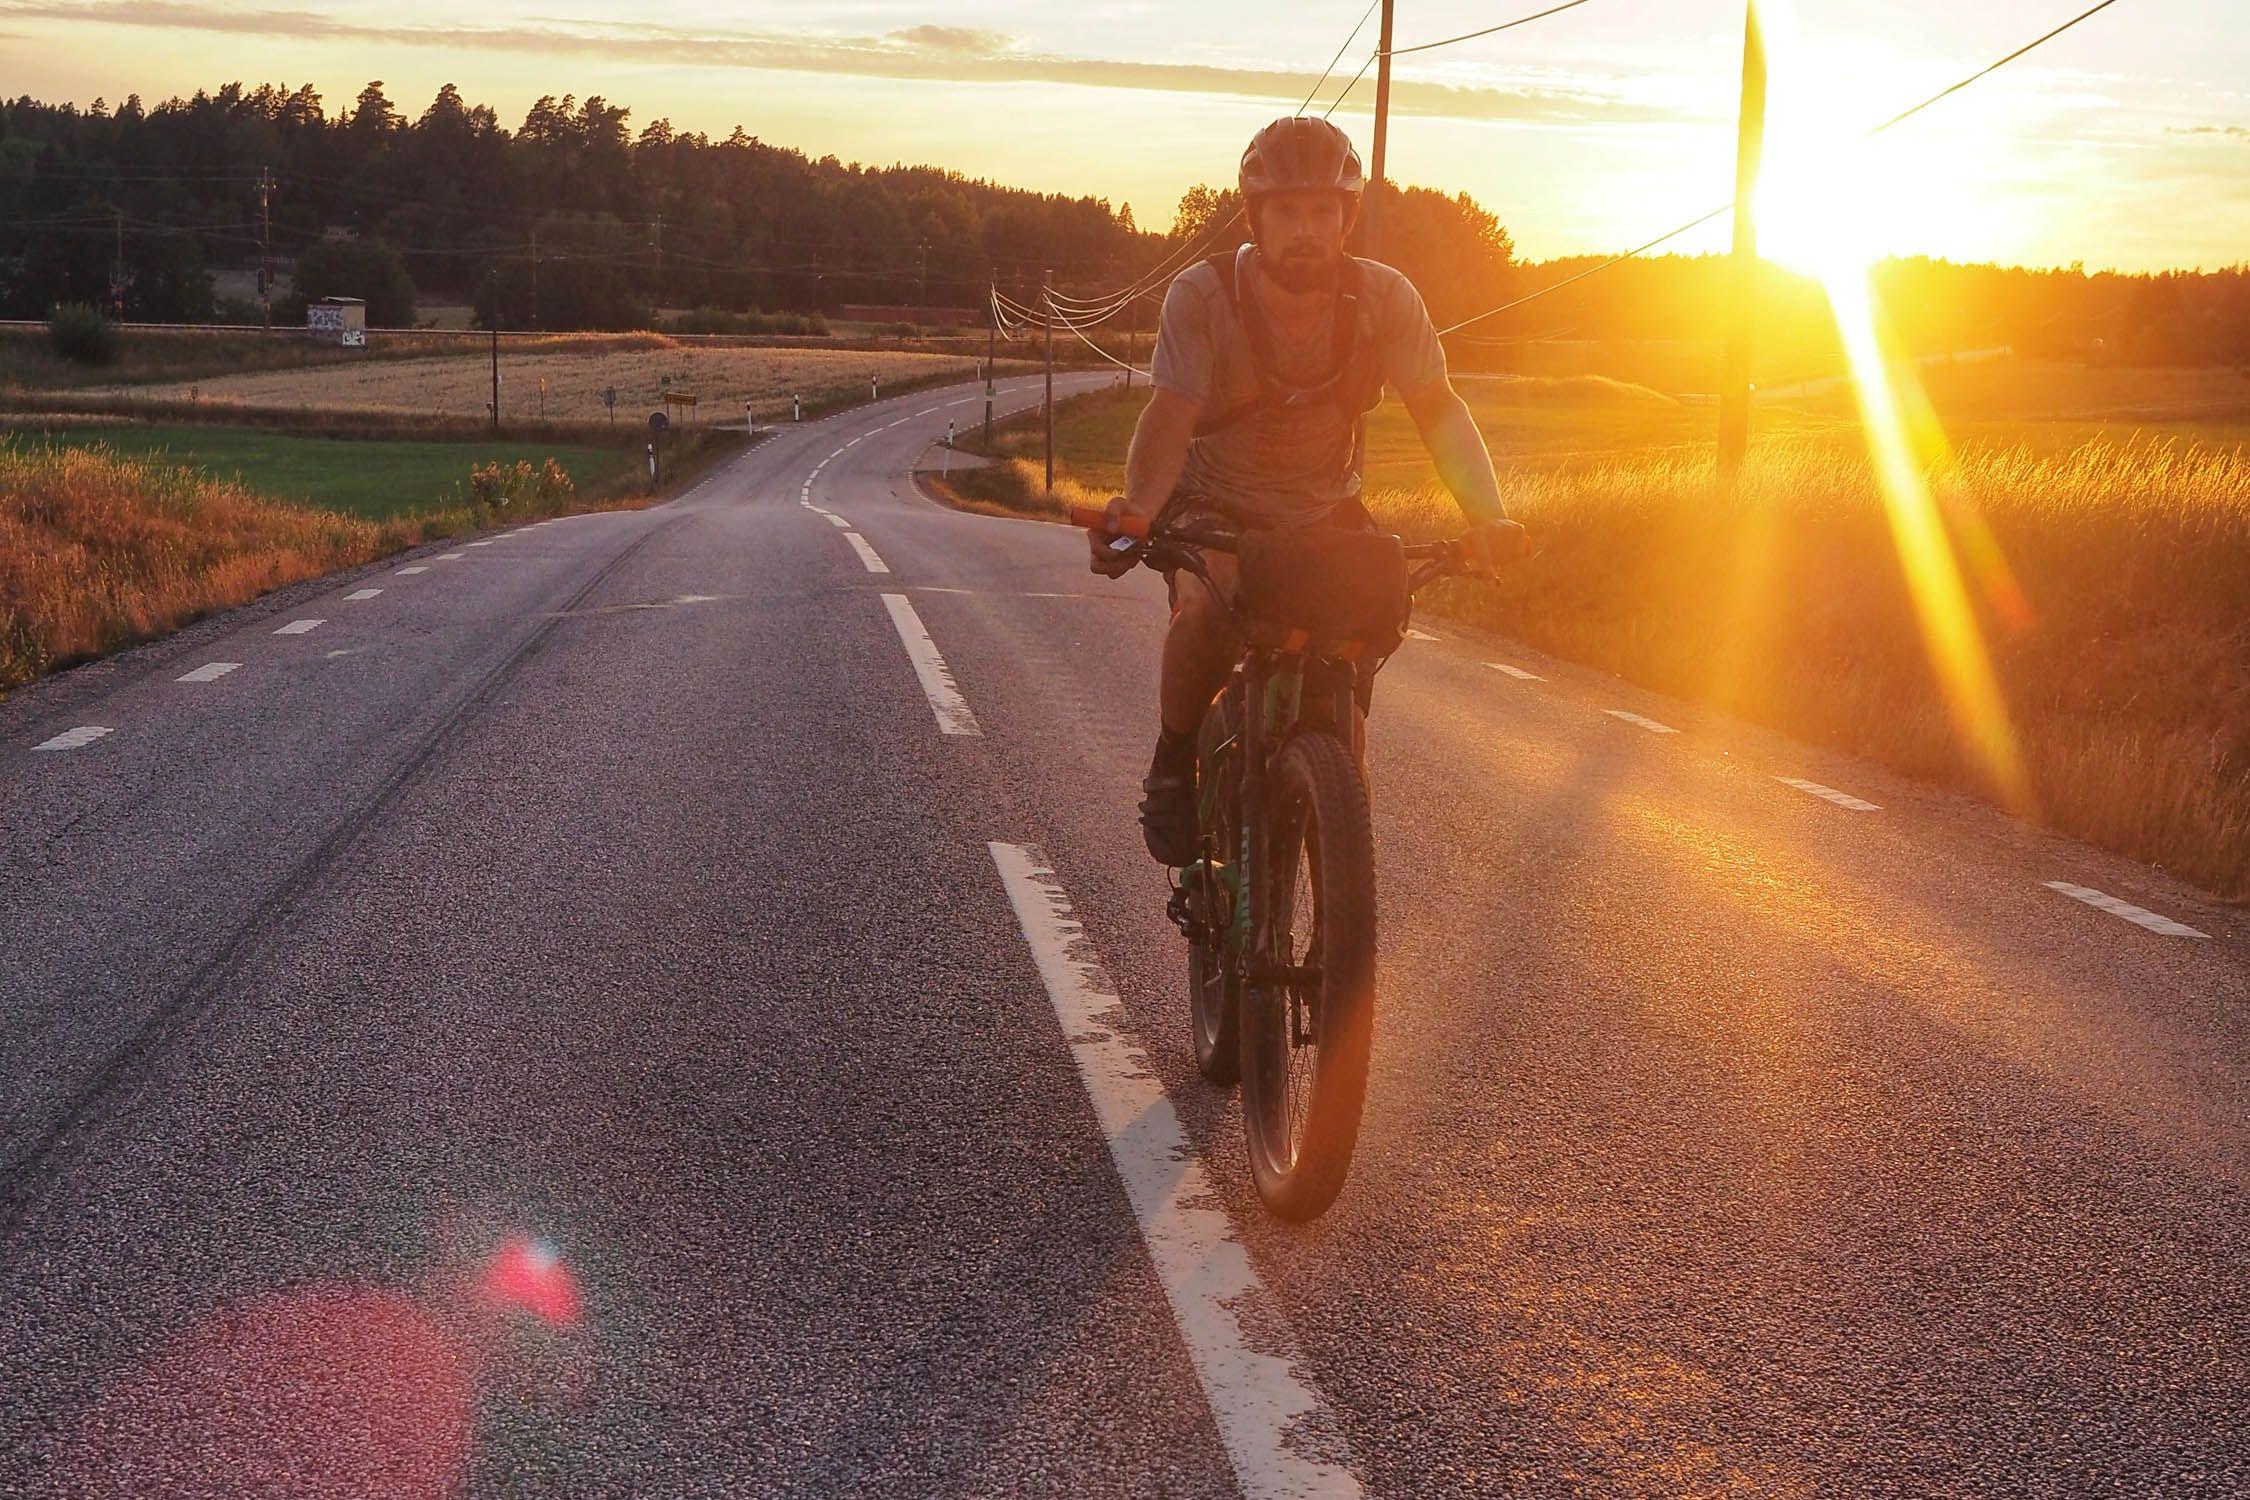 swedish-safari-300-bikepacking-route_40.jpg